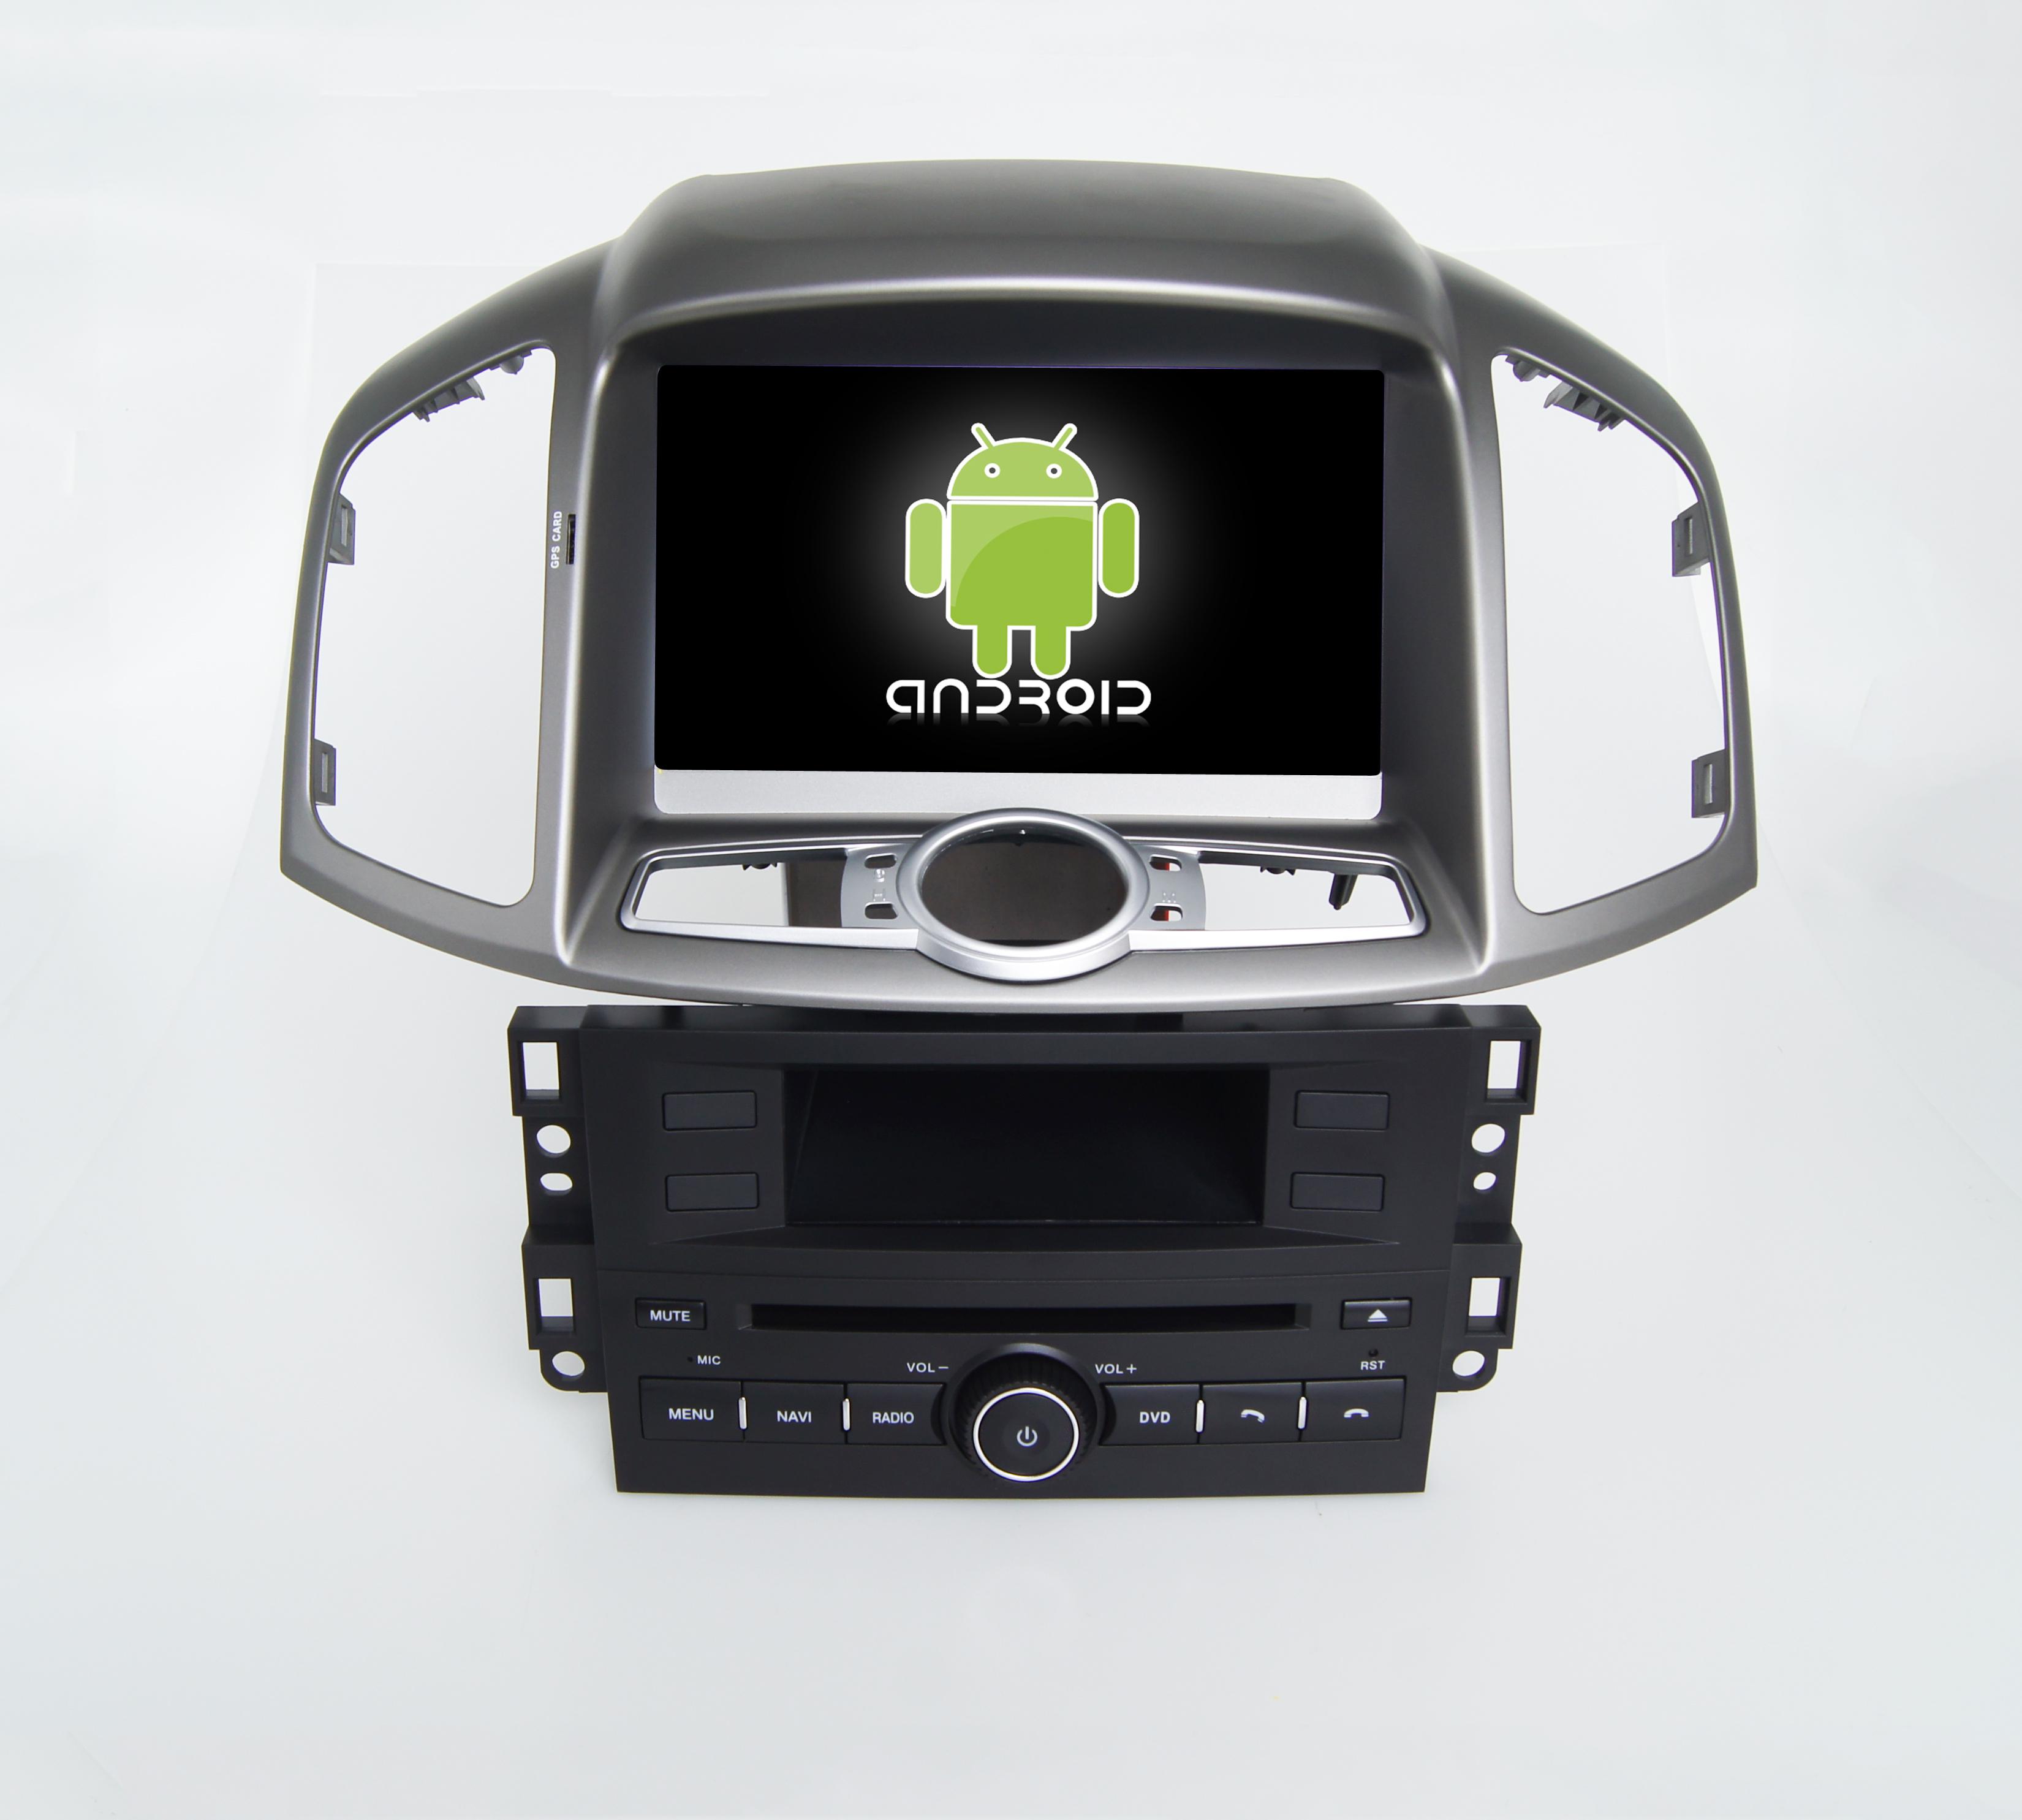 Штатная магнитола CARMEDIA КR-8030-T8 для Chevrolet Captiva 2011-2015 Android 7.1.2 smartch kw99 smart watch android 5 1 os mtk6580 bluetooth 4 0 3g wifi gps rom 8gb ram 512m heart rate monitoring pk kw88 h1